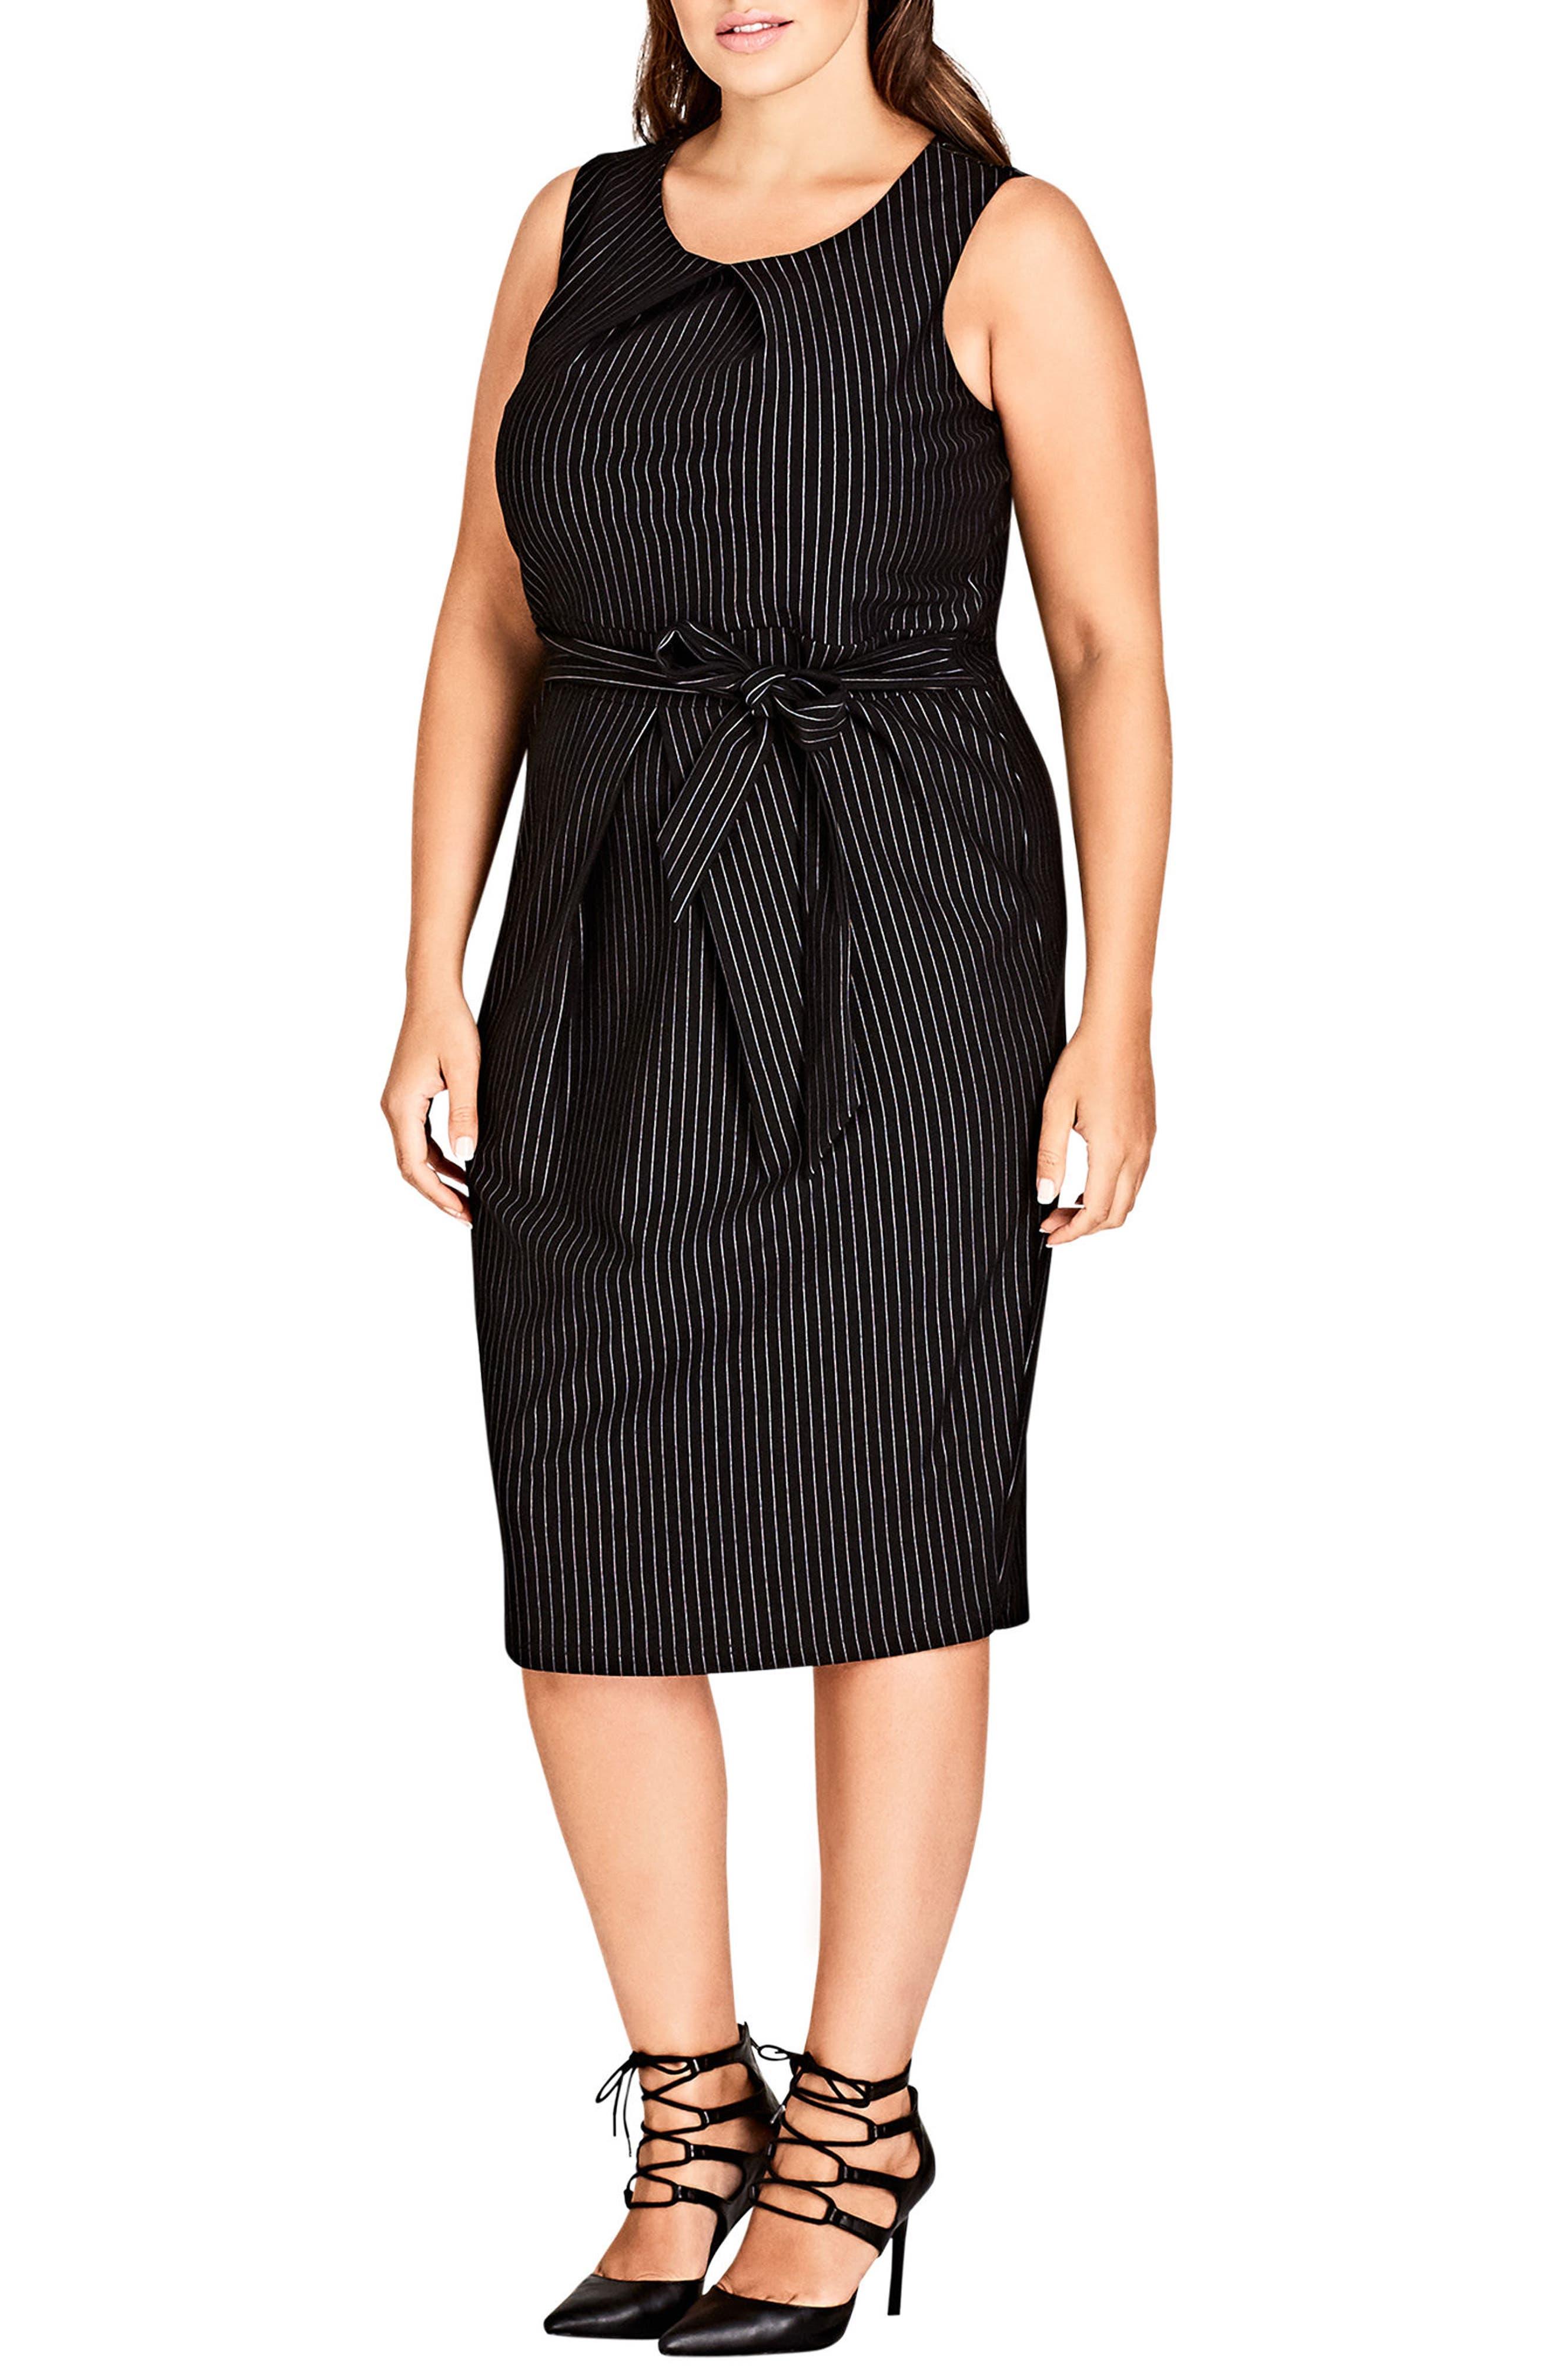 Aster Stripe Sheath Dress,                             Main thumbnail 1, color,                             PIN STRIPE